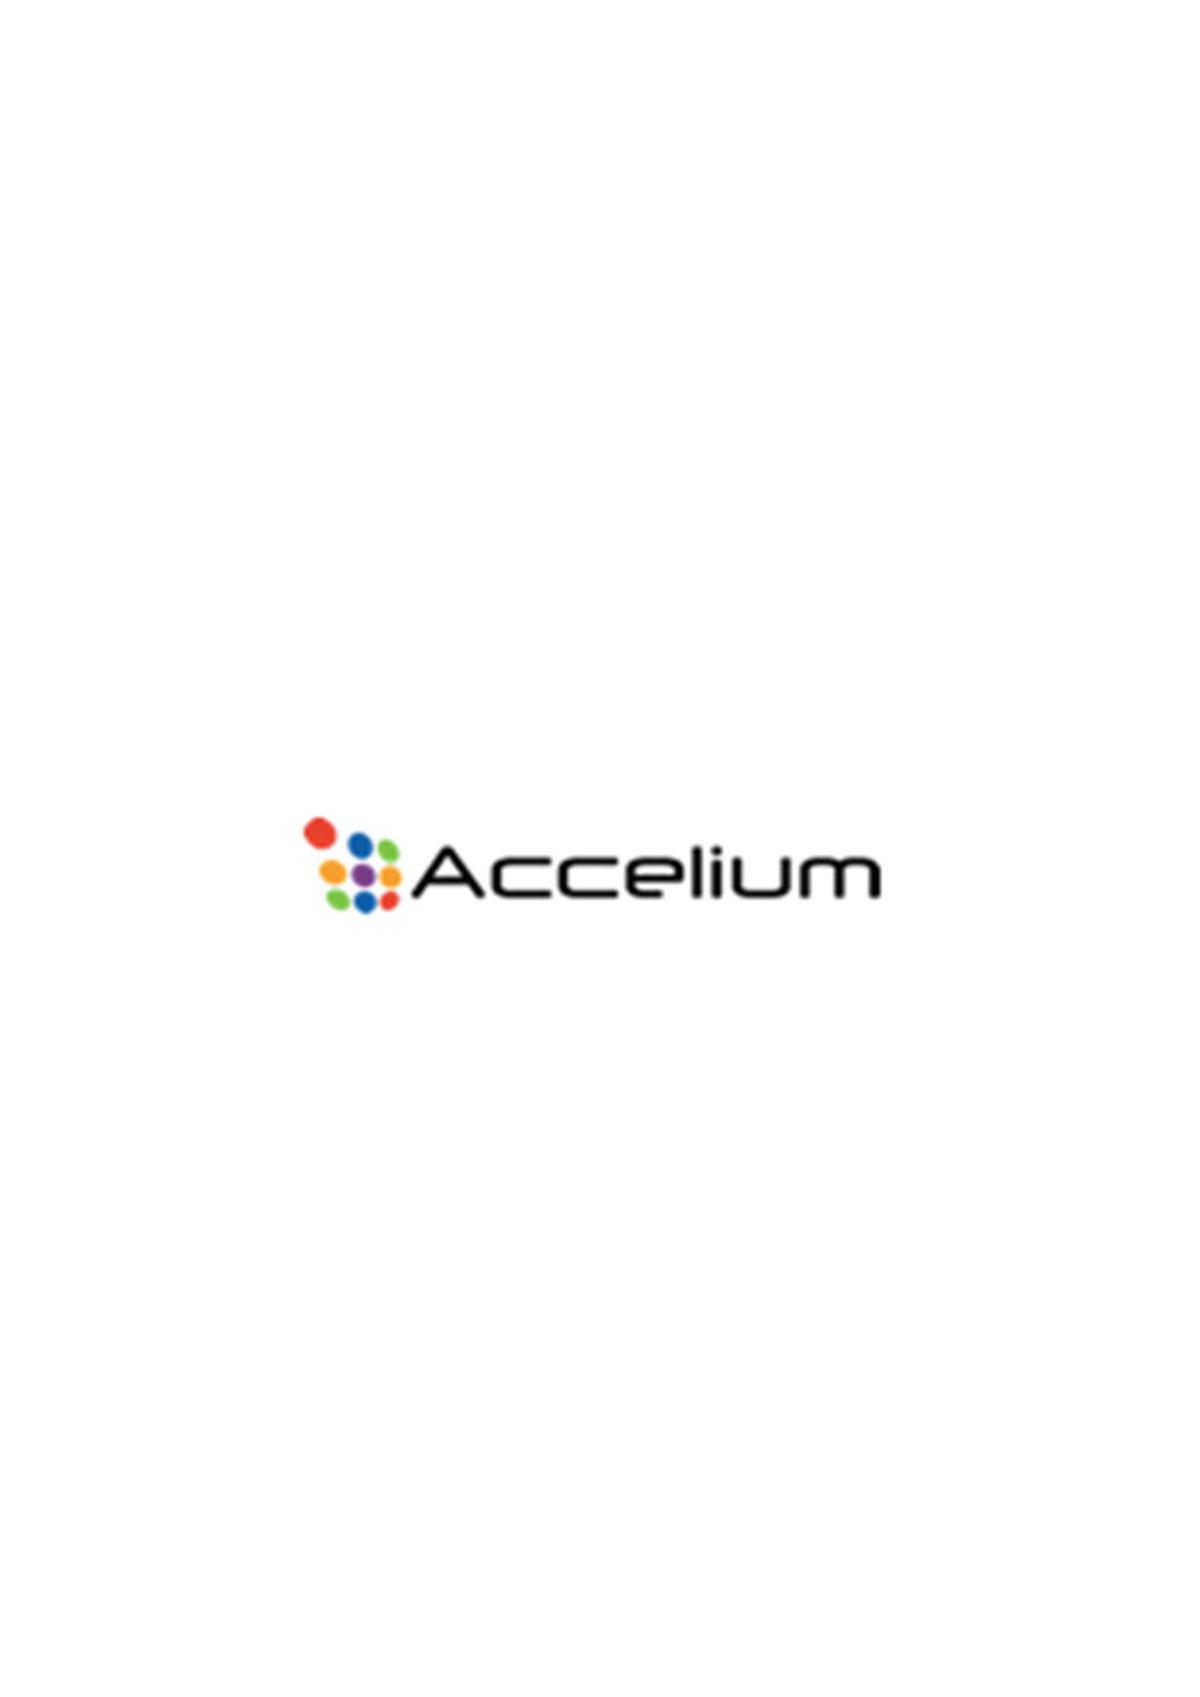 acceliumupdated-1200x1697.jpg